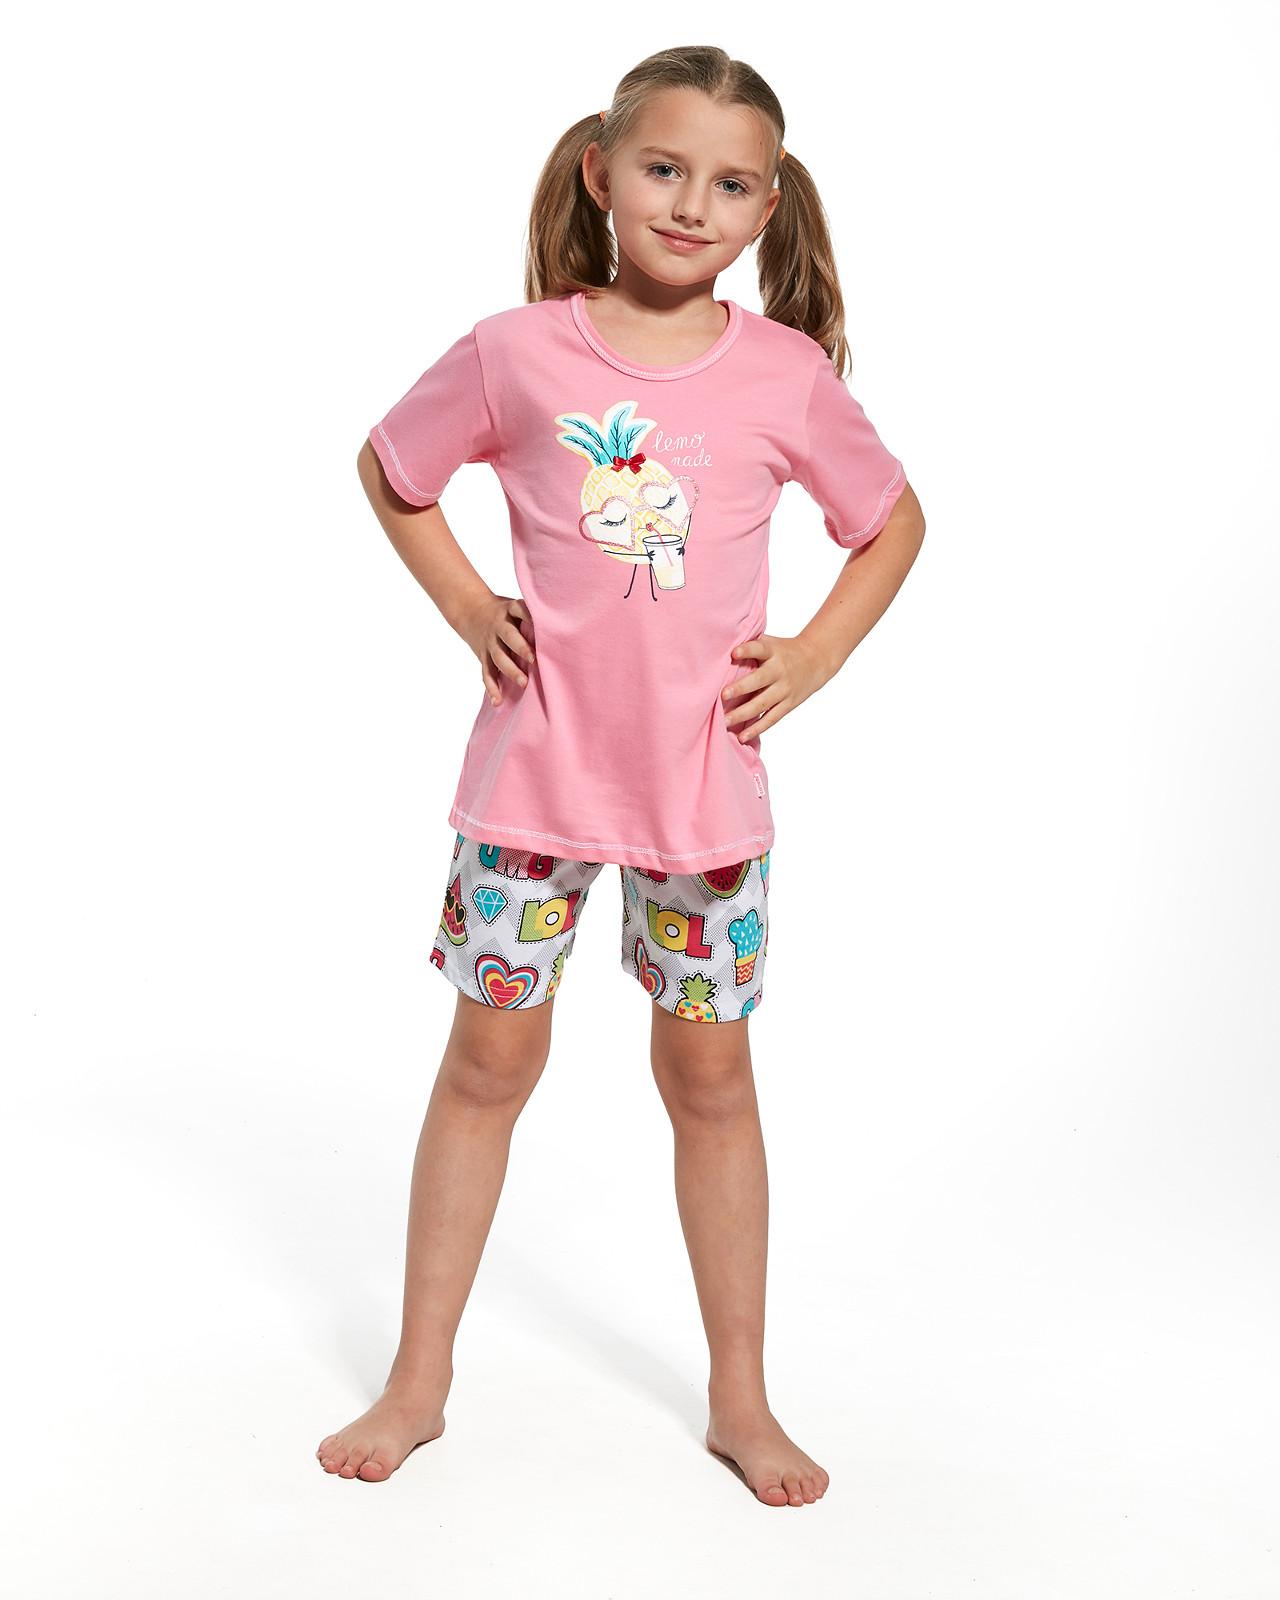 ff5192b0ca038d Piżama Cornette Kids Girl 787/55 Lemonade kr/r - Bielizna dziecięca ...